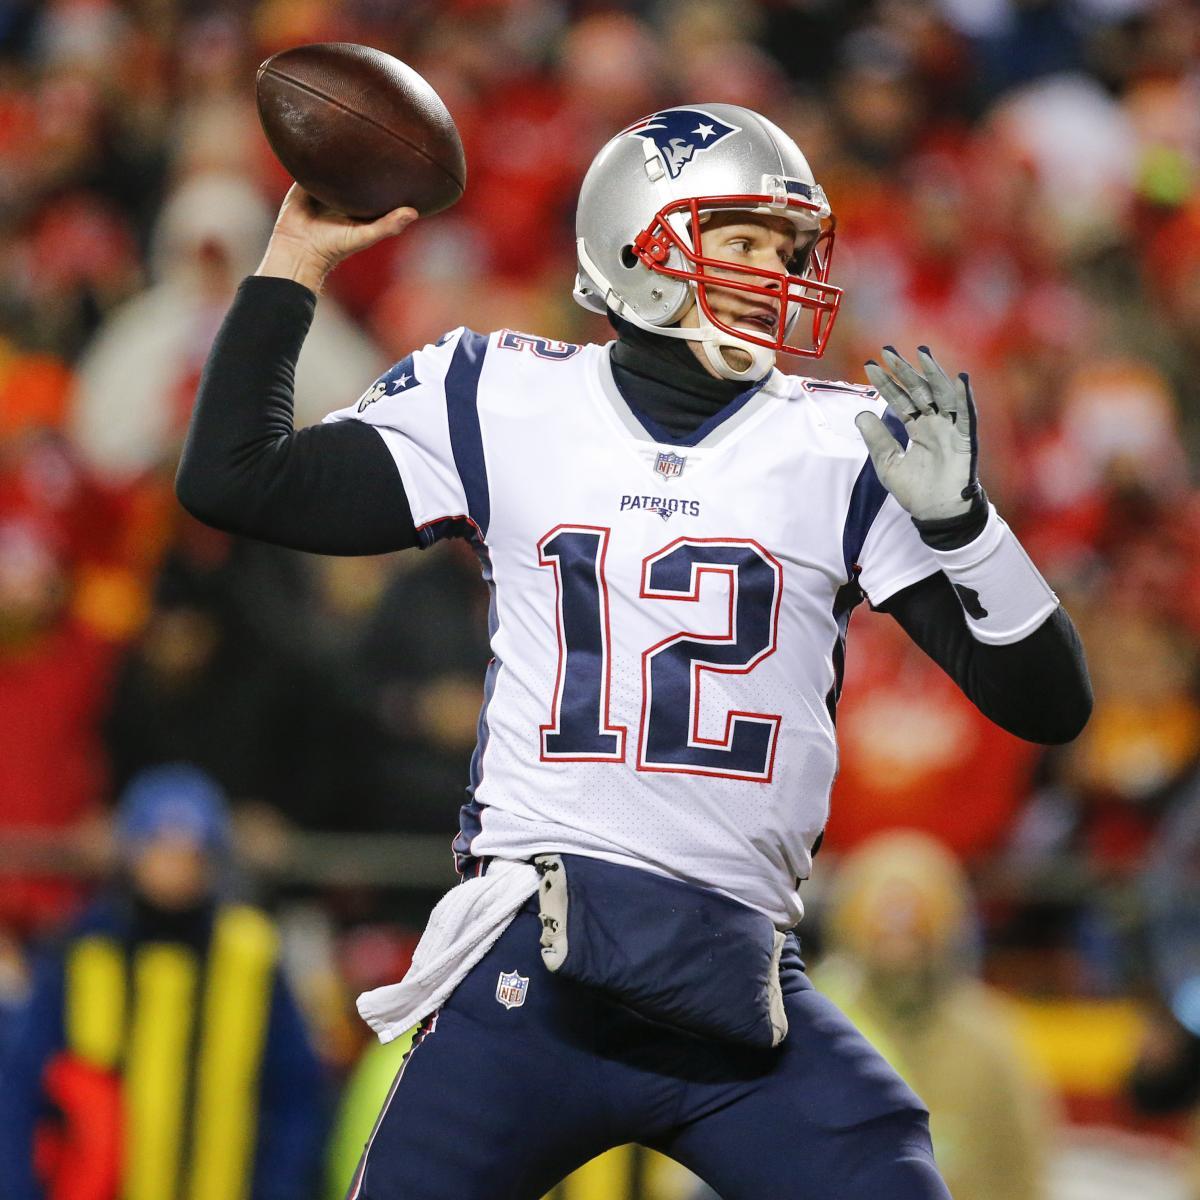 Super Bowl 2019 Prop Bets: Brady, Goff Lead RBs On Super